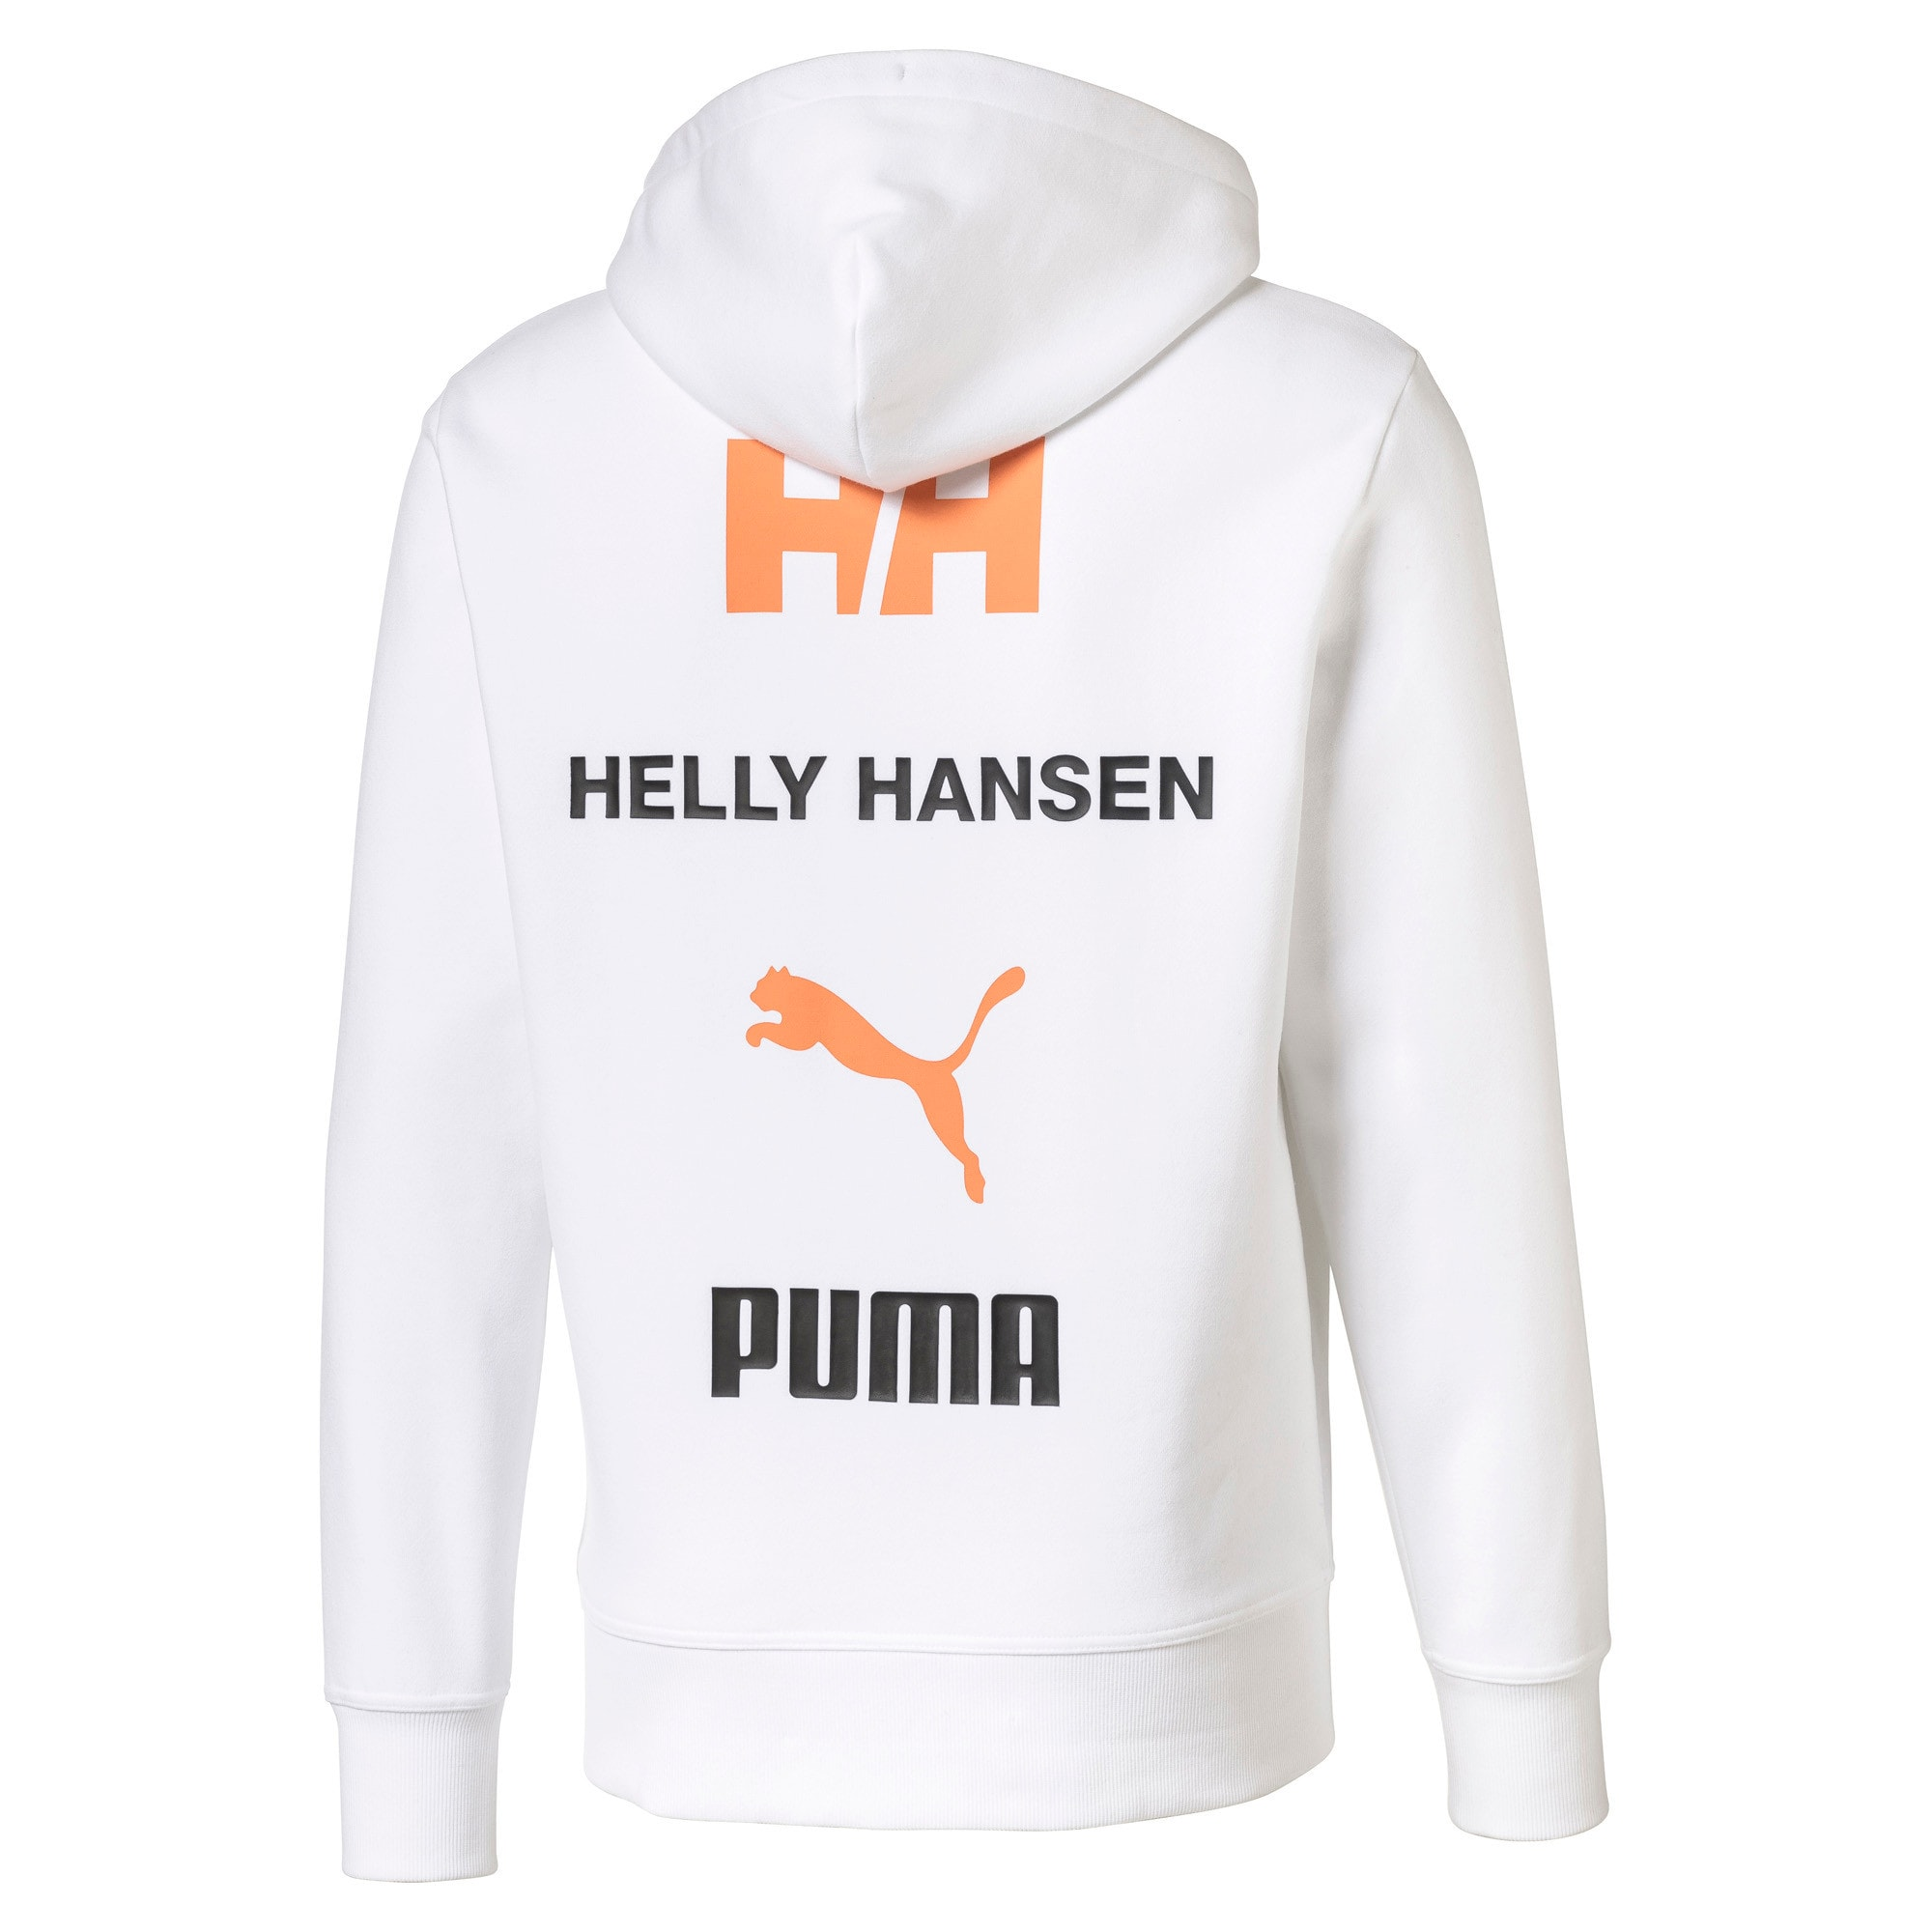 Thumbnail 2 of PUMA x HELLY HANSEN Long Sleeve Hoodie, Puma White, medium